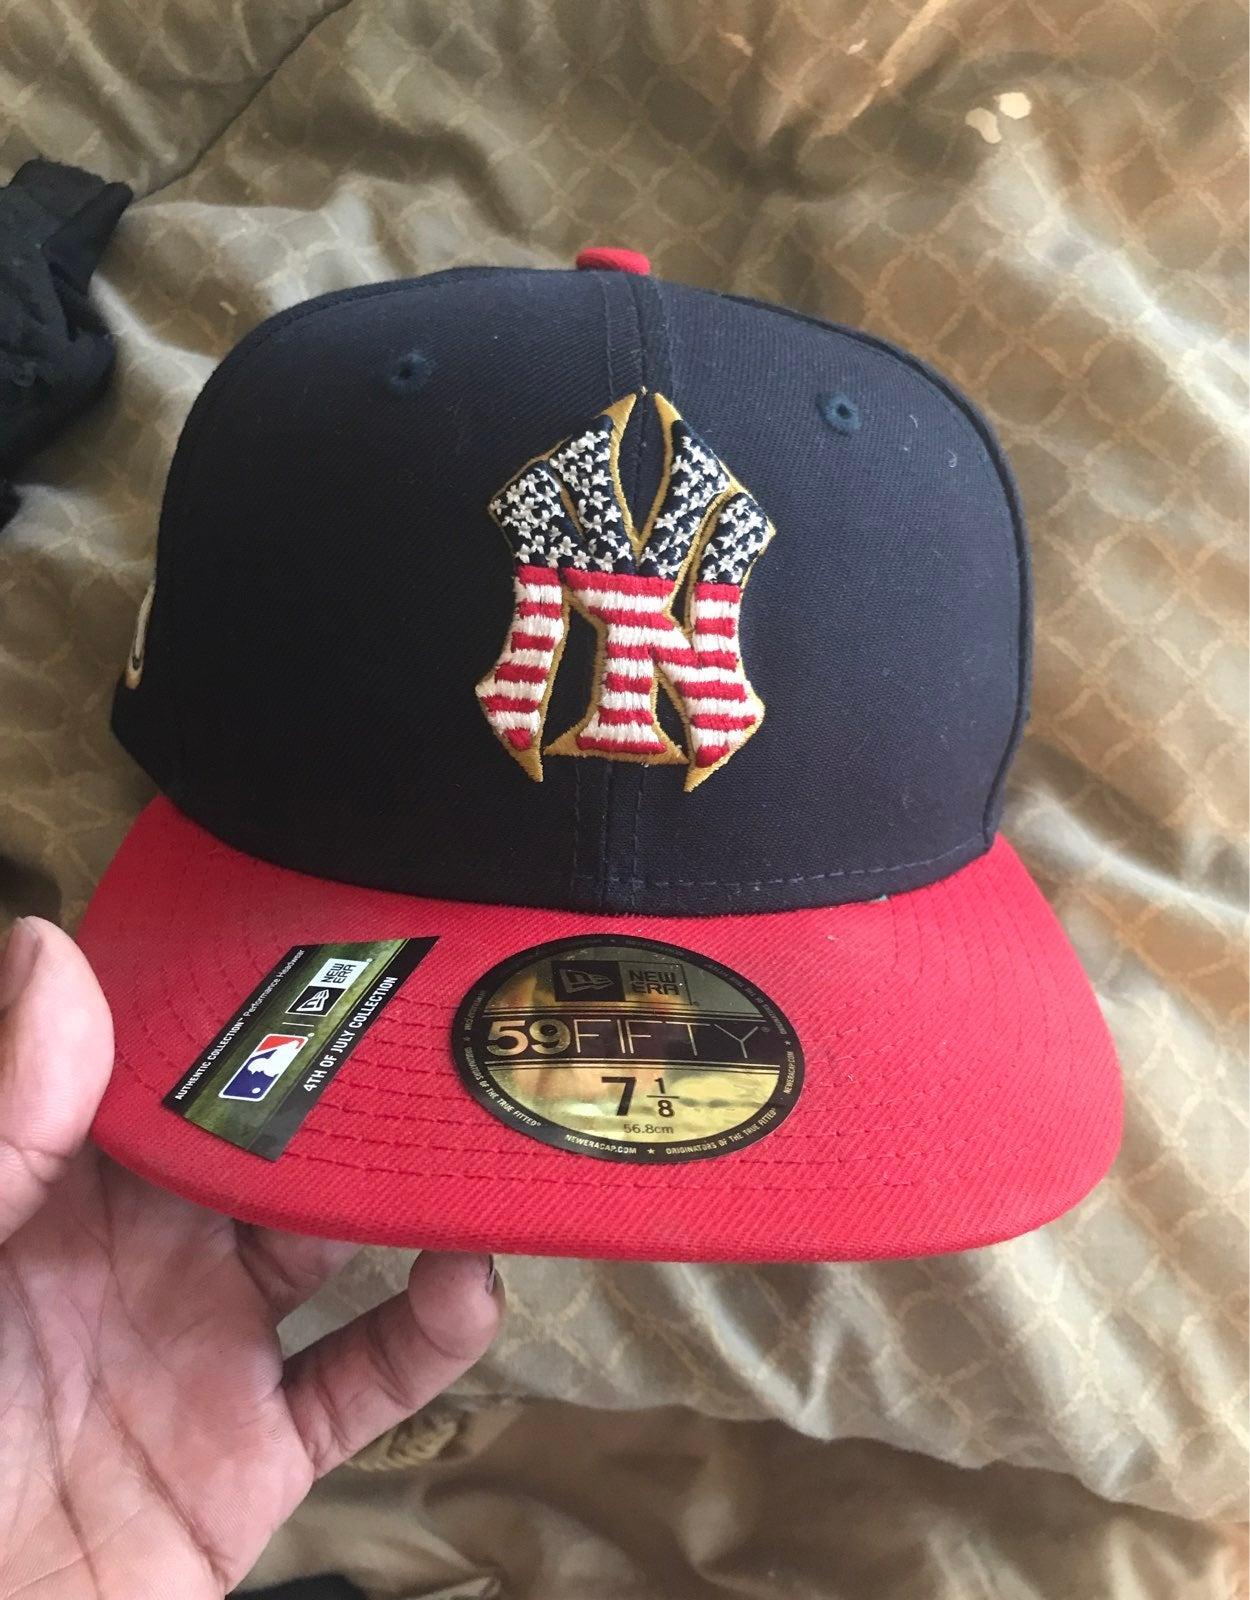 New York Yankee hat